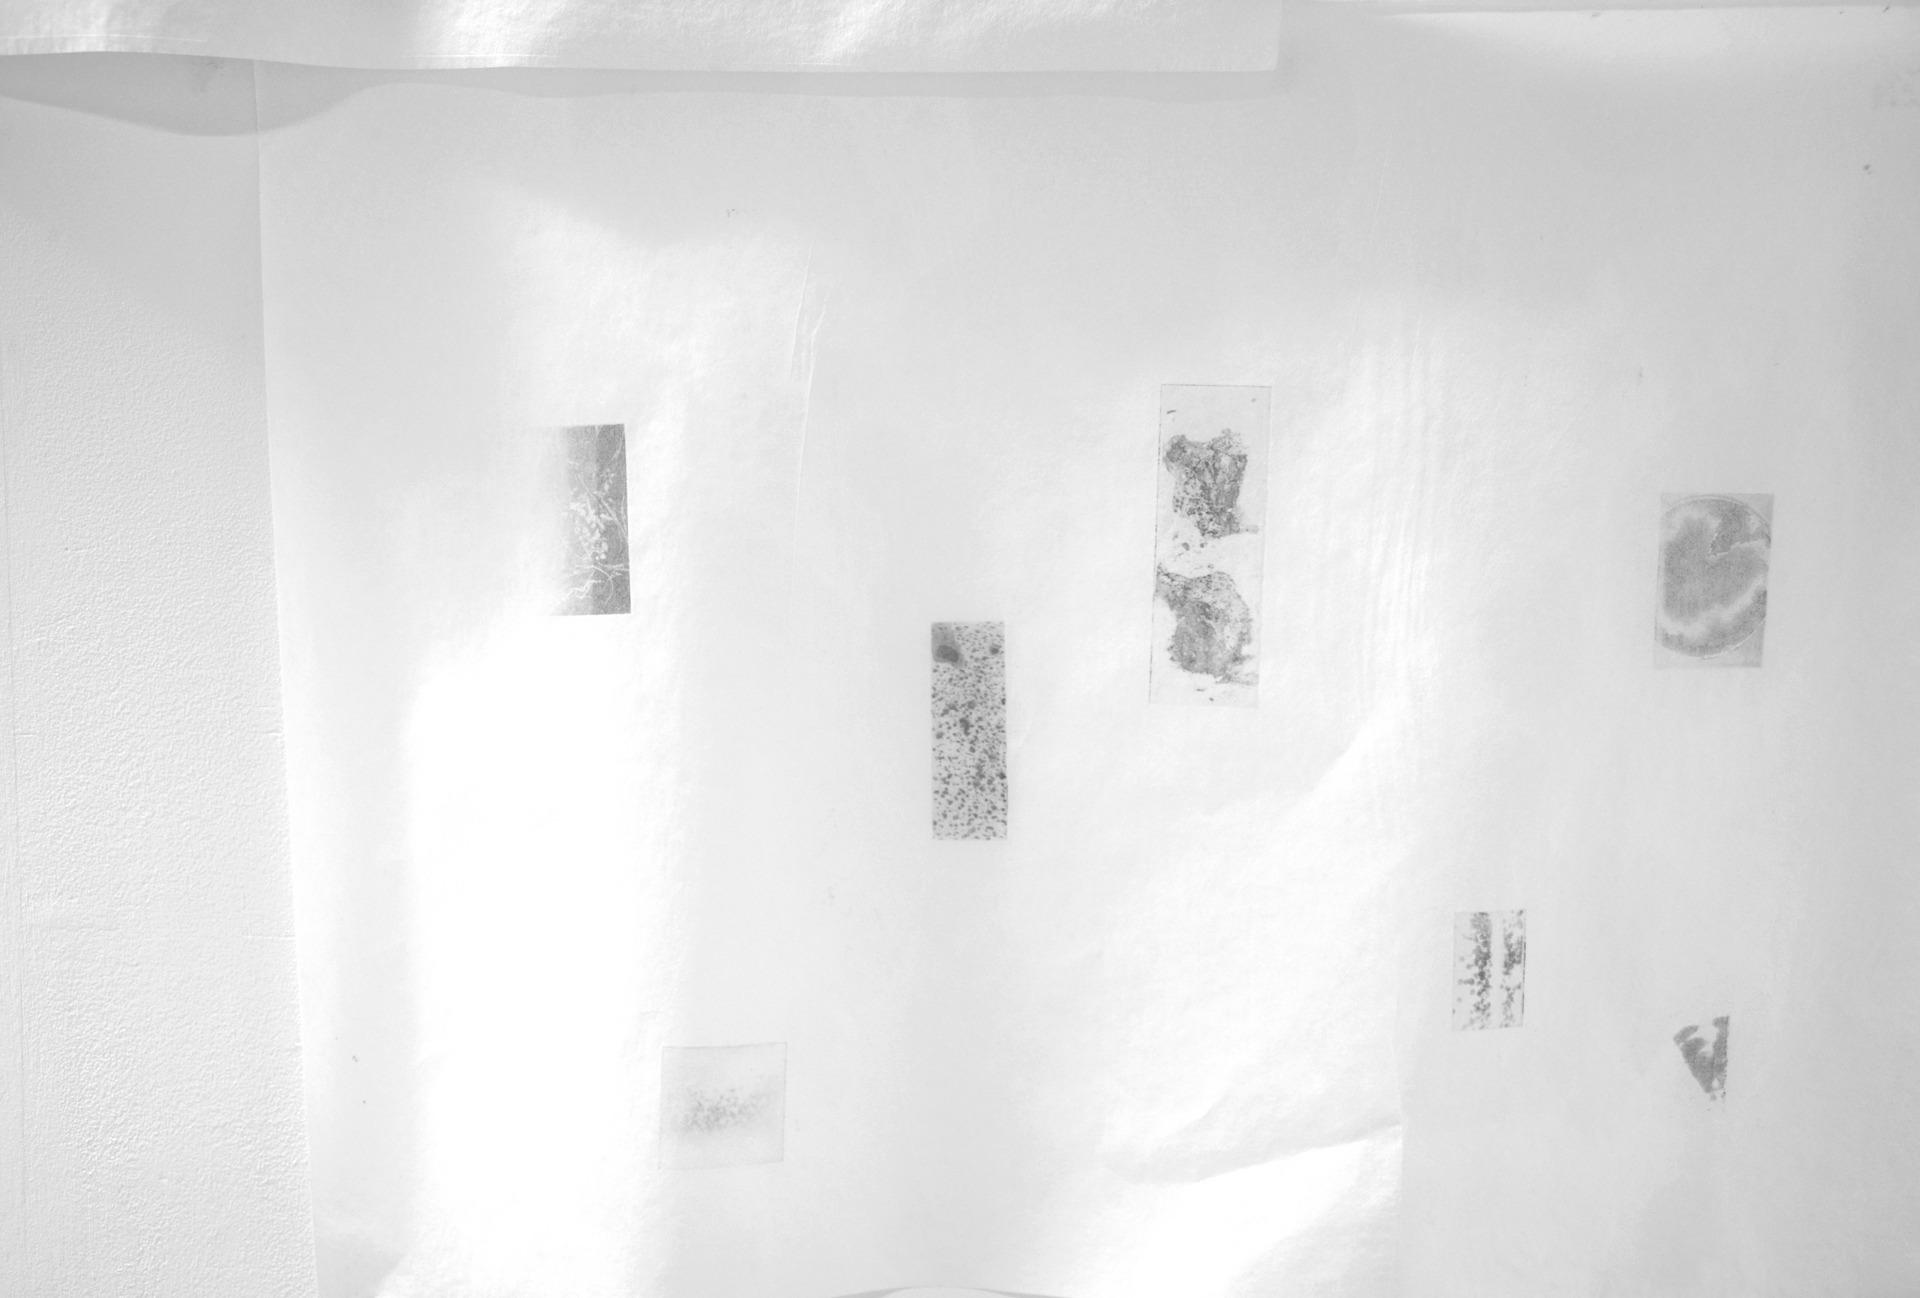 Fragmented Moments (details)